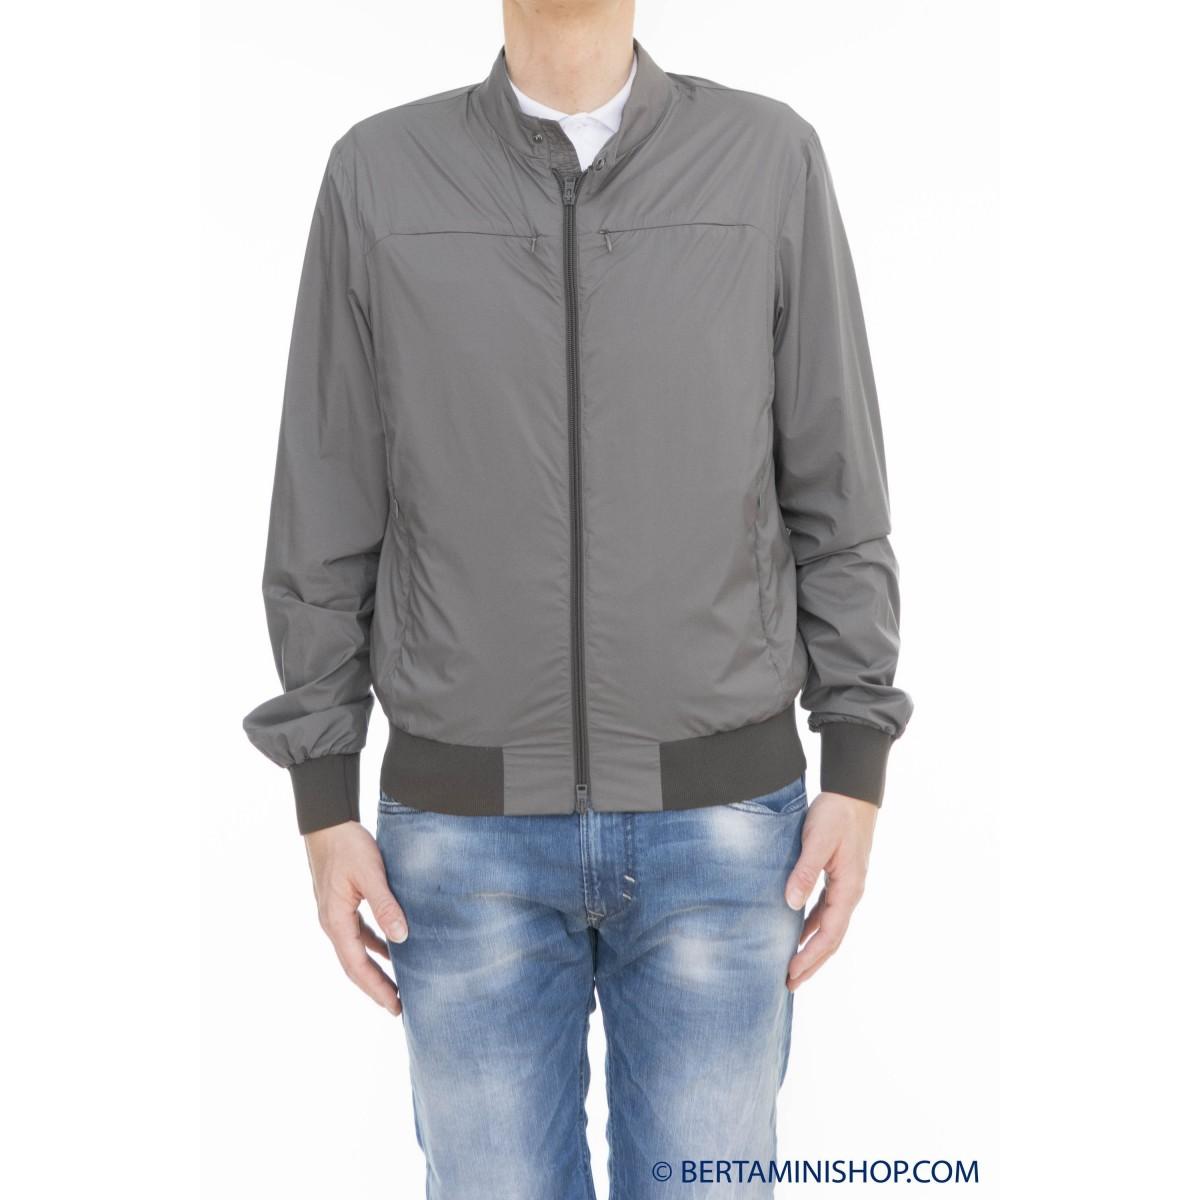 Sports Jacket Herno Man - GI0062U 19288 2700 - Pietra